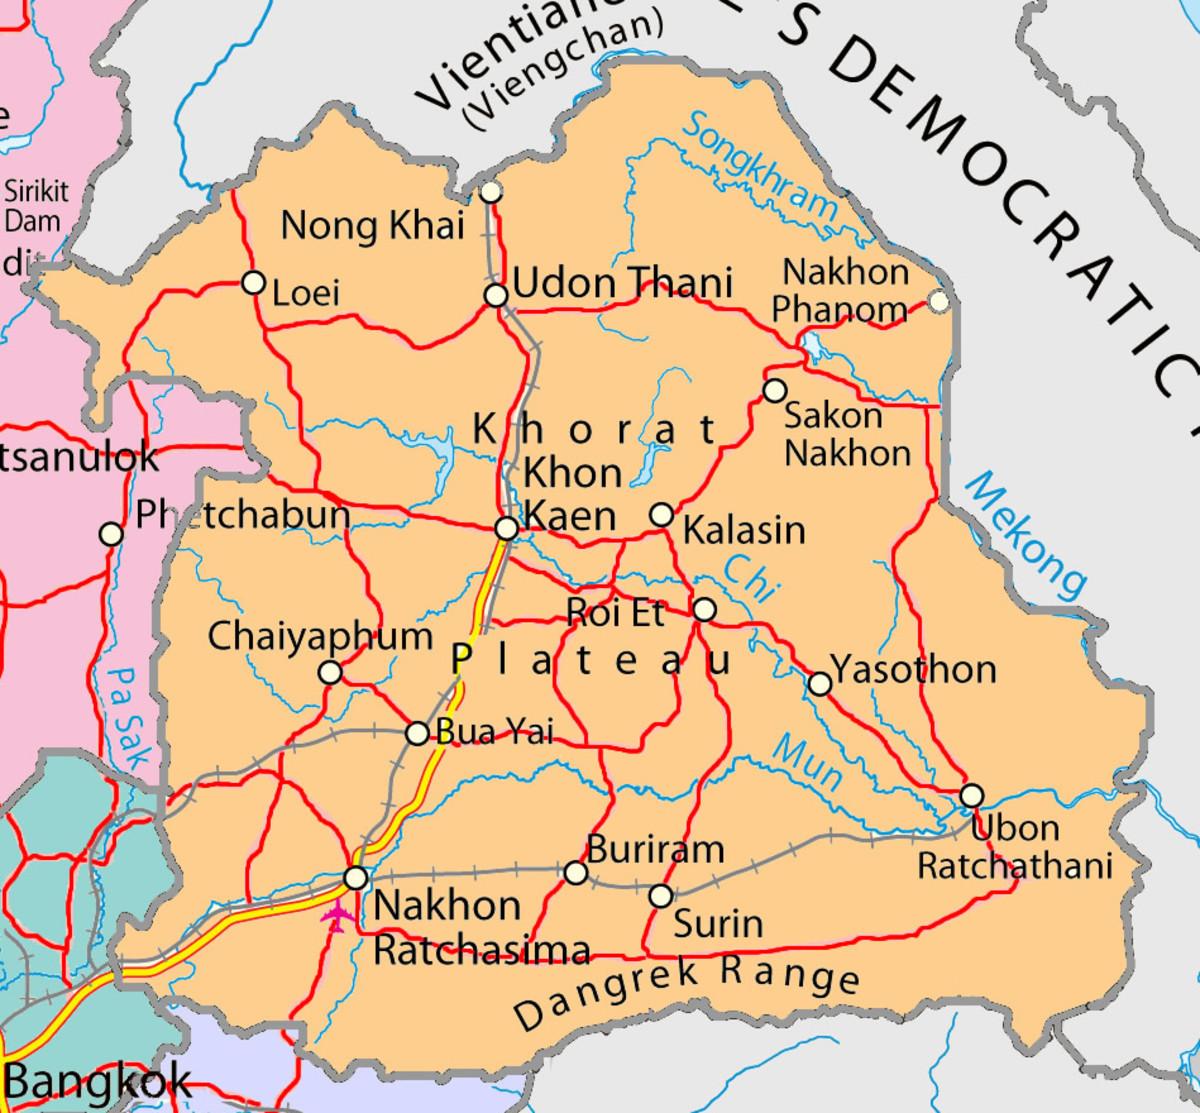 Northeastern Thailand AKA Isan